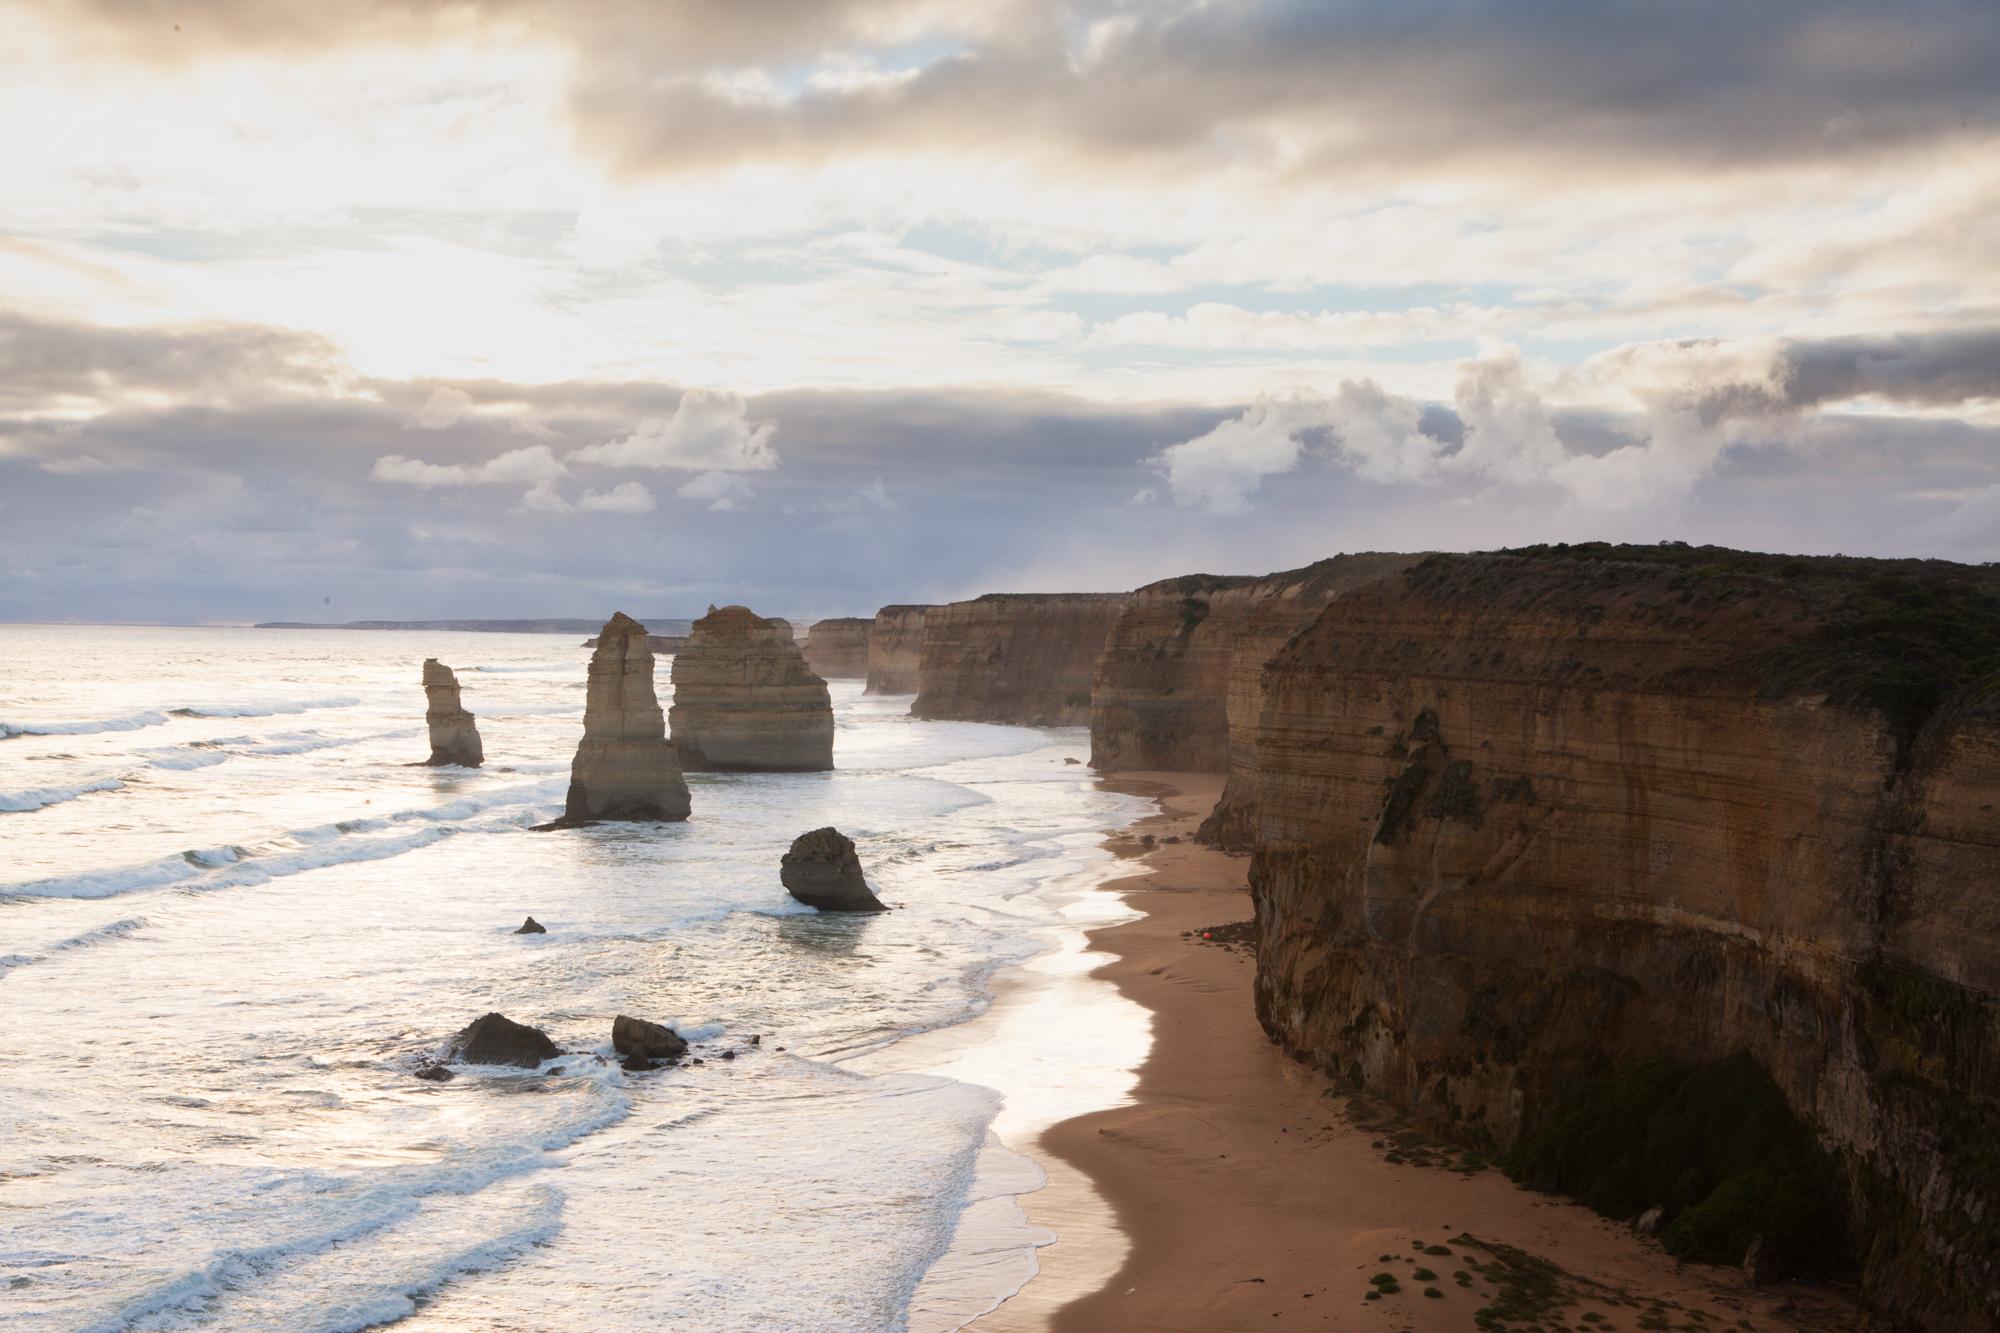 55-Bec_Kilpatrick_Photography_AustraliaIMG_6923